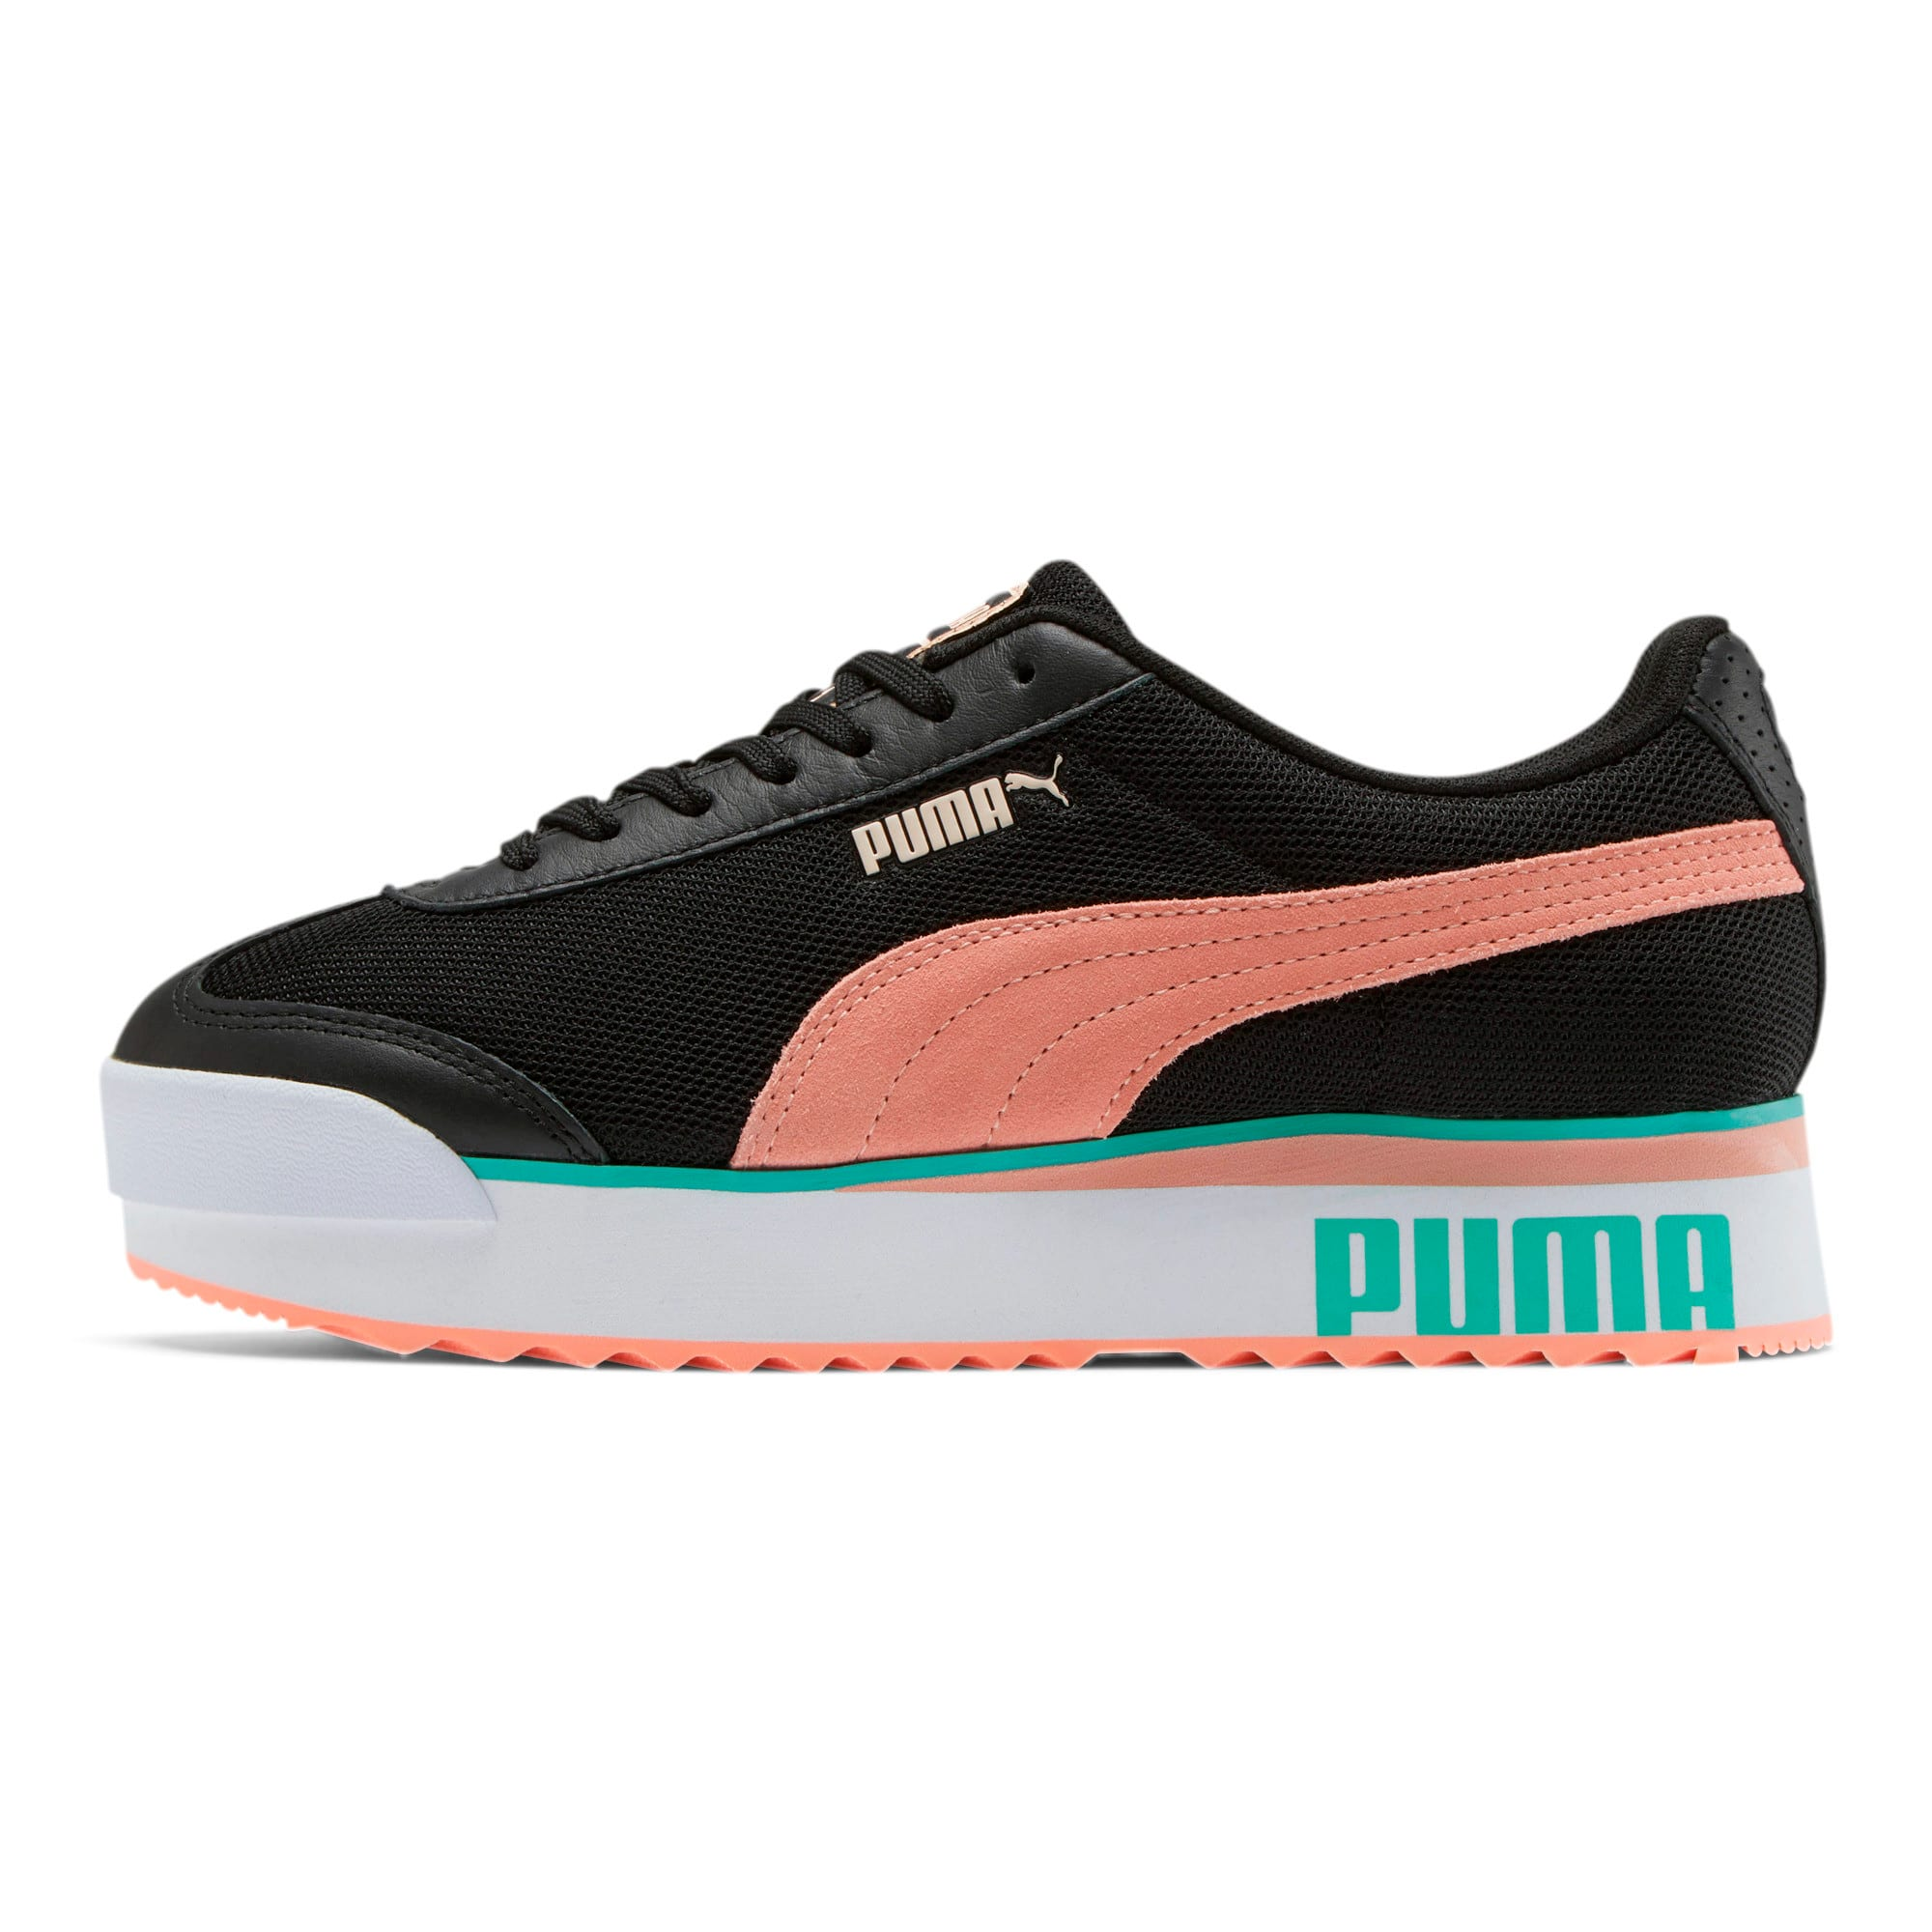 Thumbnail 1 of Roma Amor Mesh Mix Women's Sneakers, Black-Br Peach-Ble Turquoise, medium